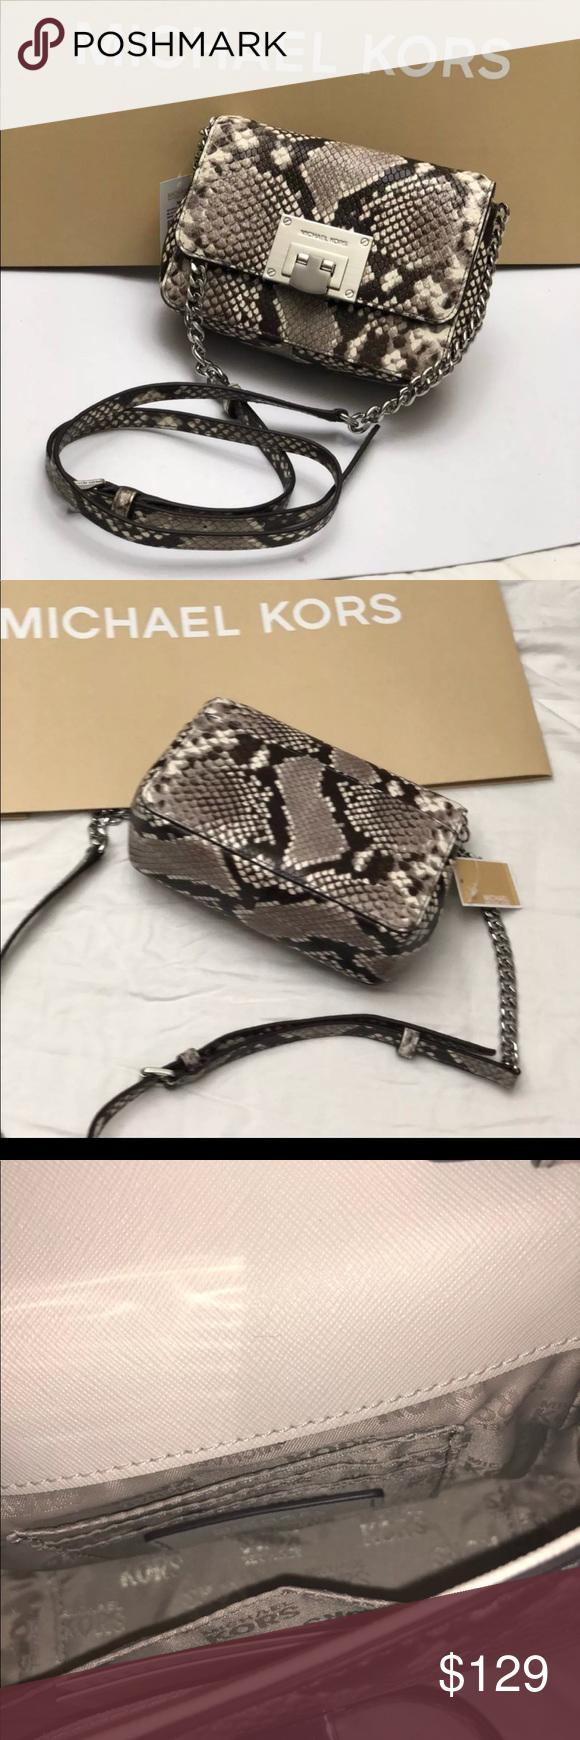 d2991b8753ea Authentic Michael Kors python Crossbody bag/Clutch Michael Kors Small  Clutch/ Cross body Brand